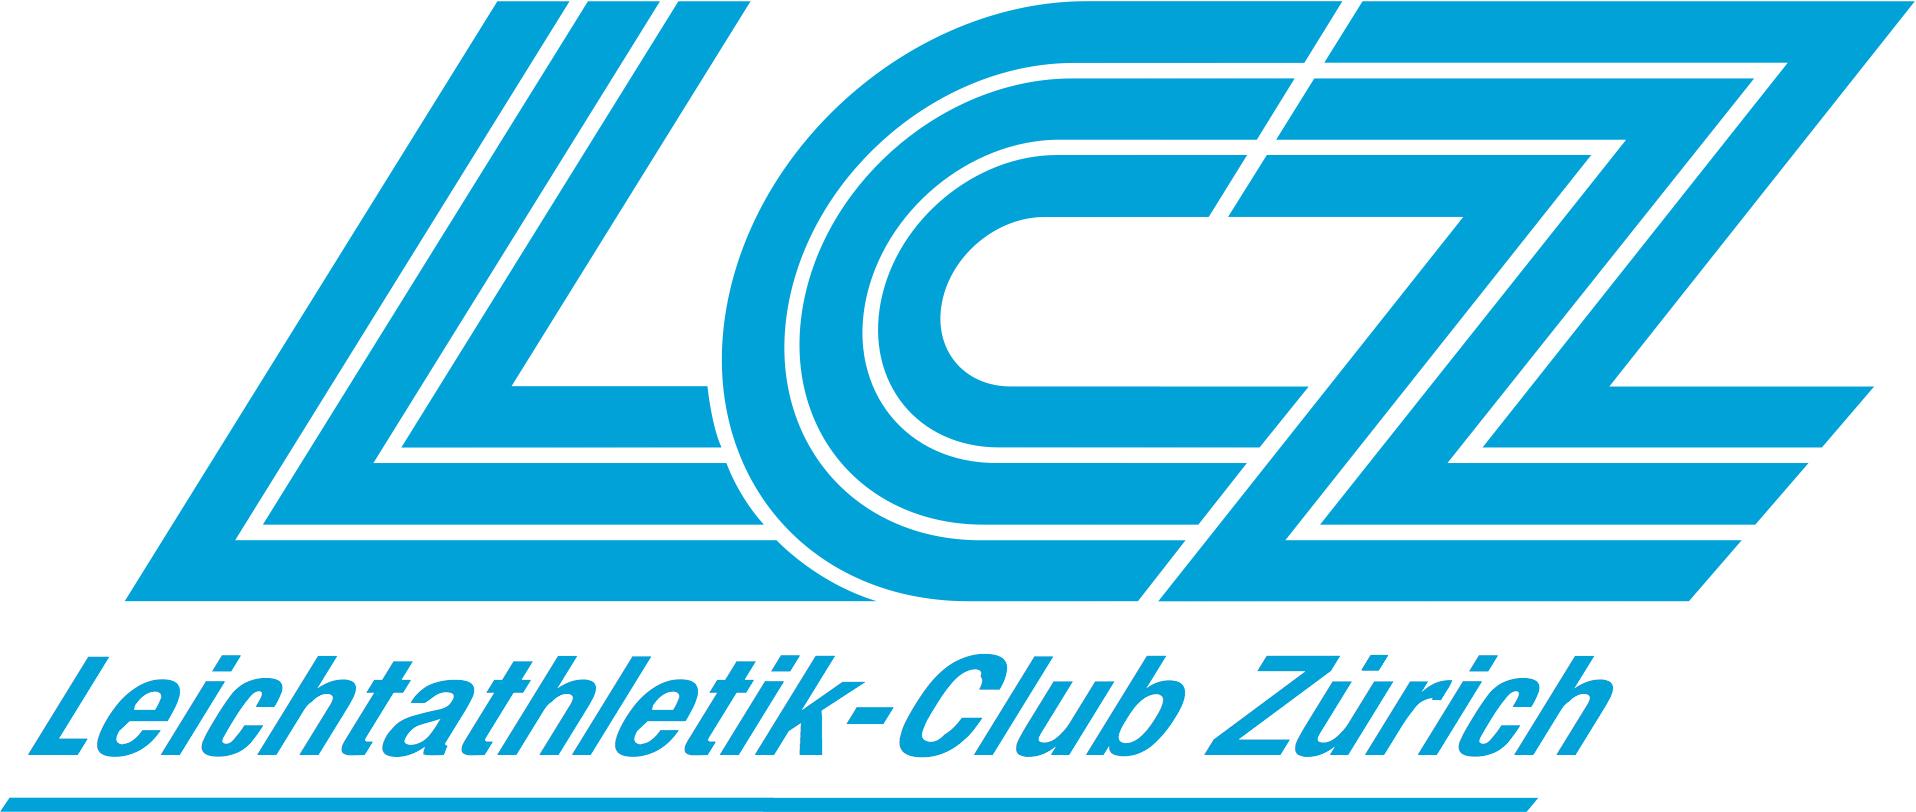 LCZ-Logo.jpg